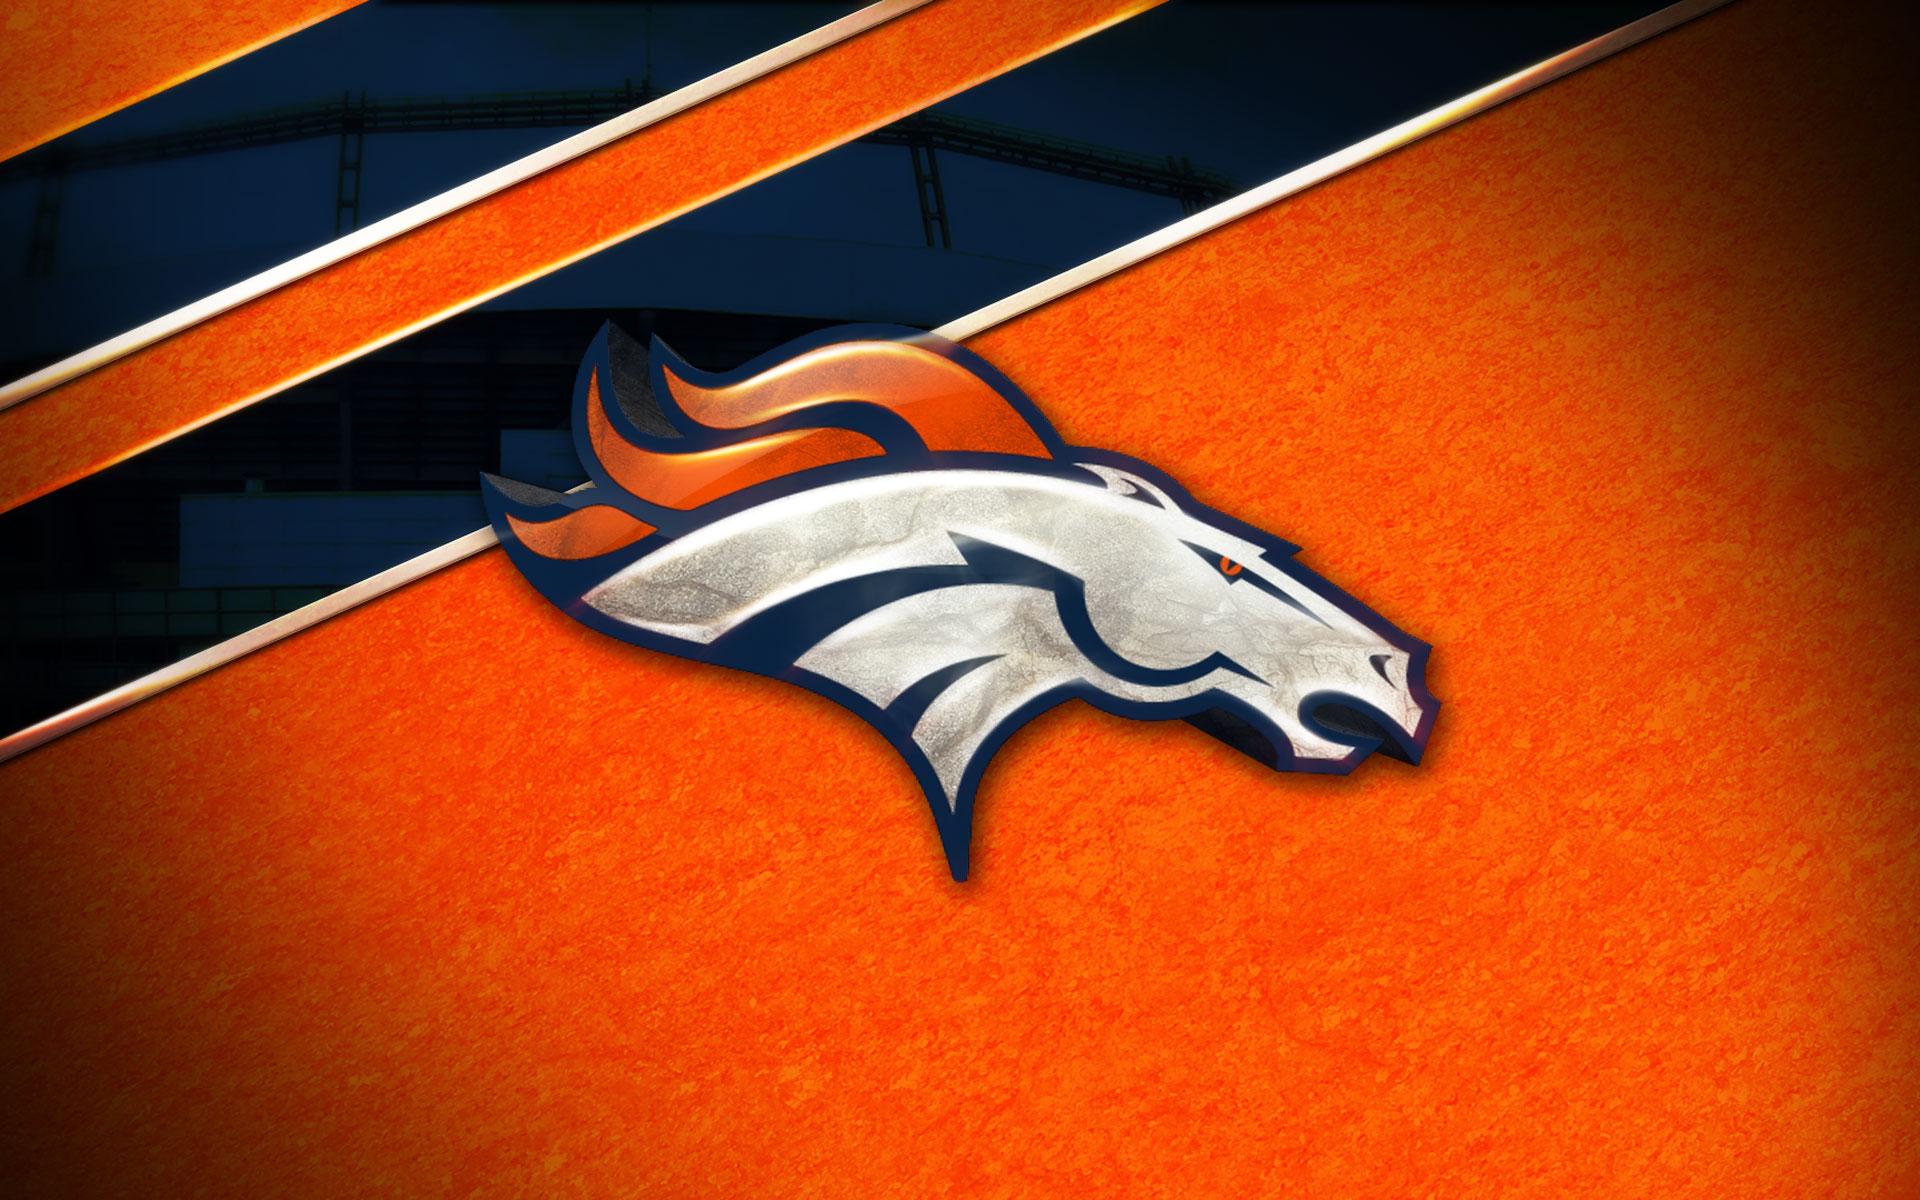 Denver Broncos Wallpaper For Phone